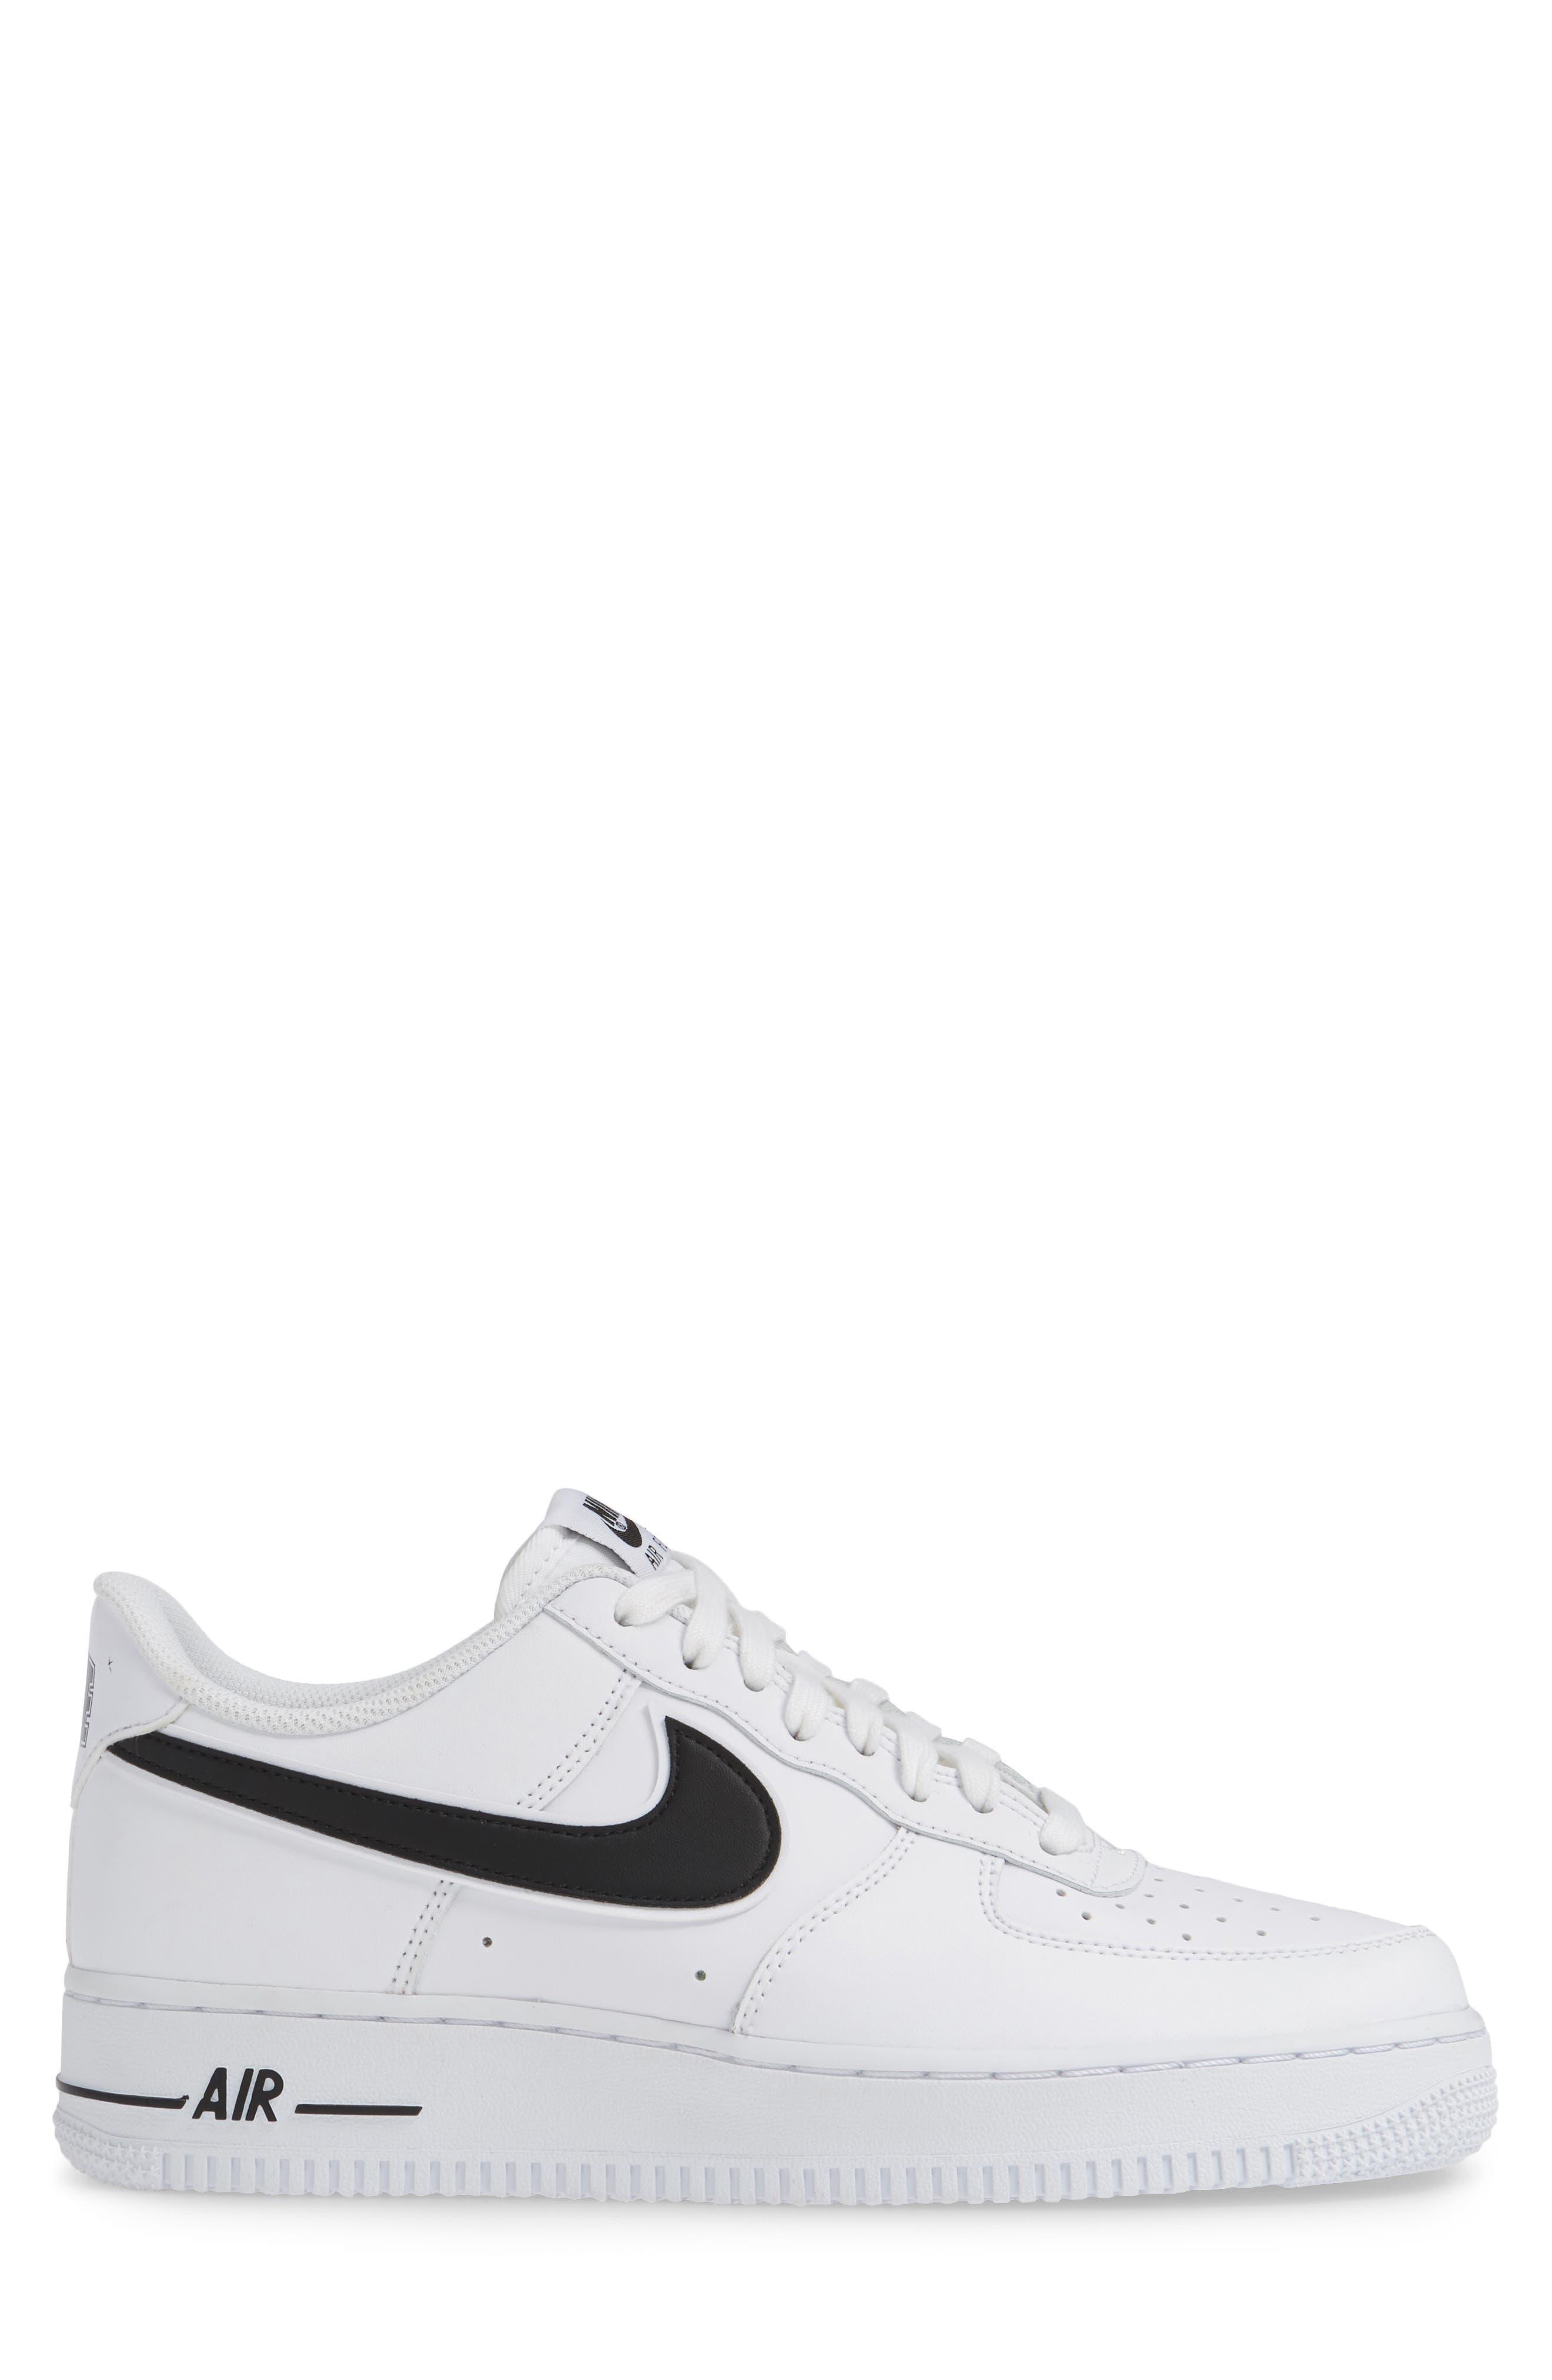 NIKE, Air Force 1 '07 3 Sneaker, Alternate thumbnail 3, color, WHITE/ BLACK